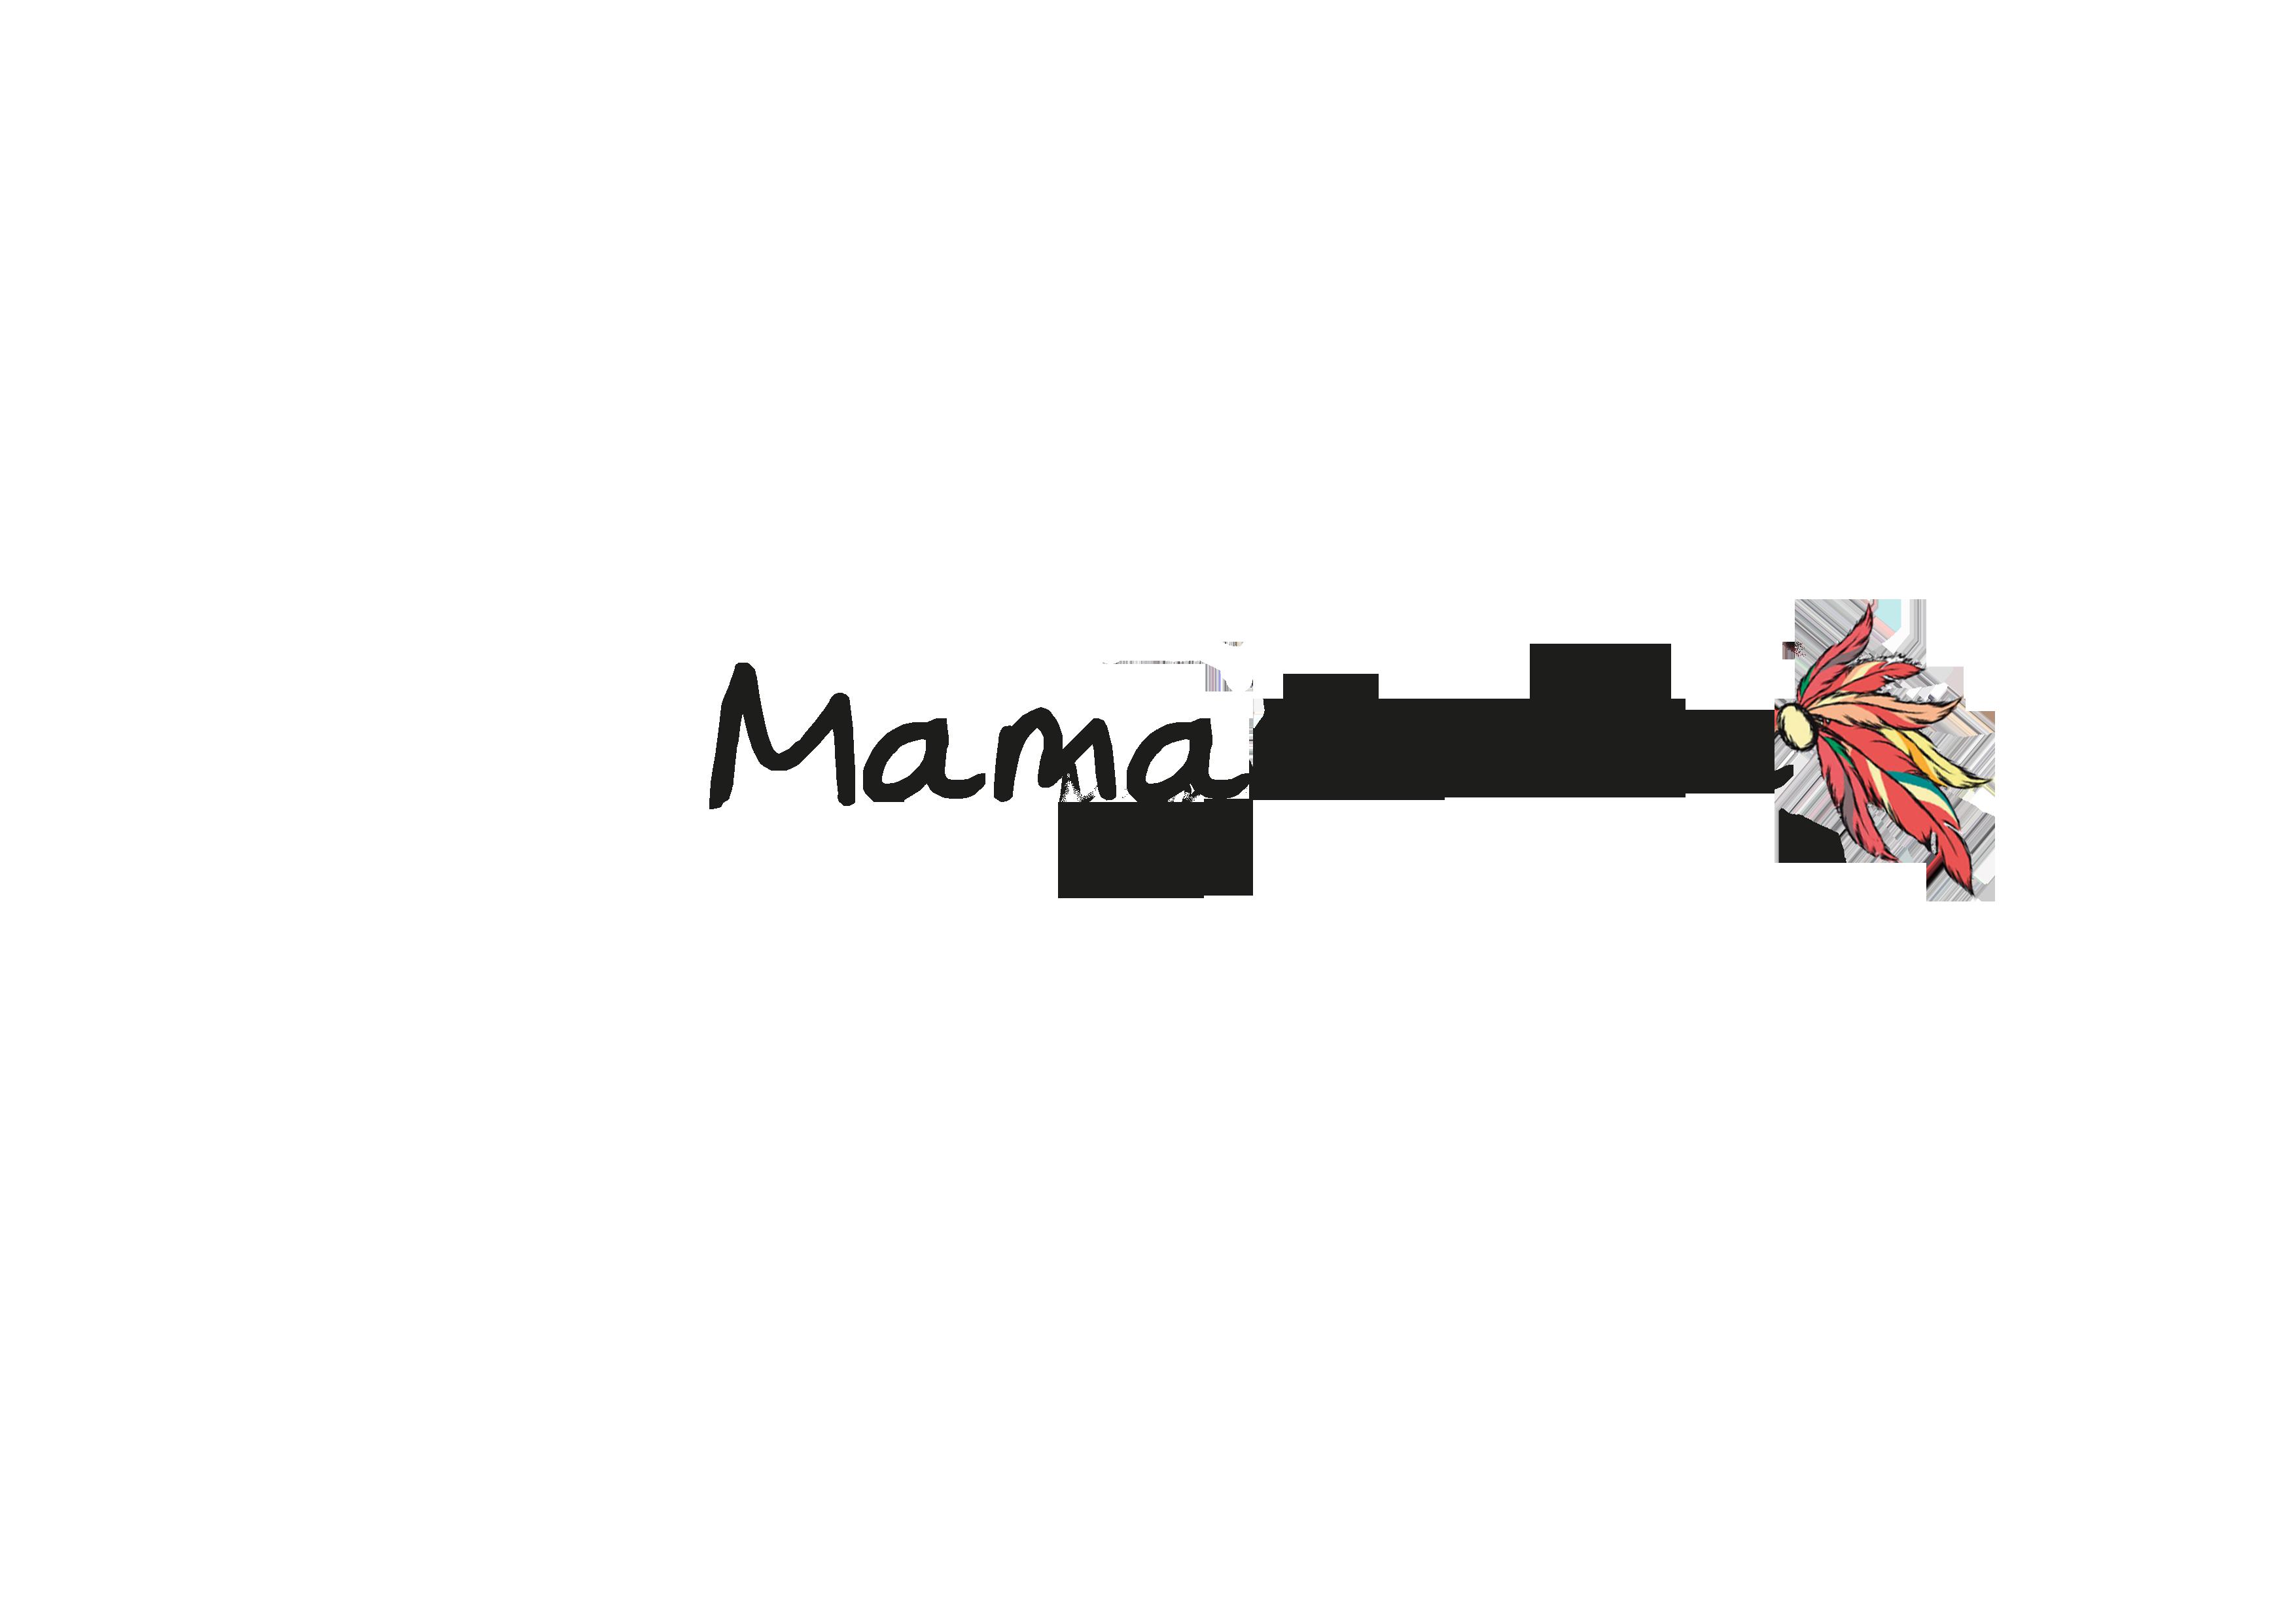 MamaQuilla